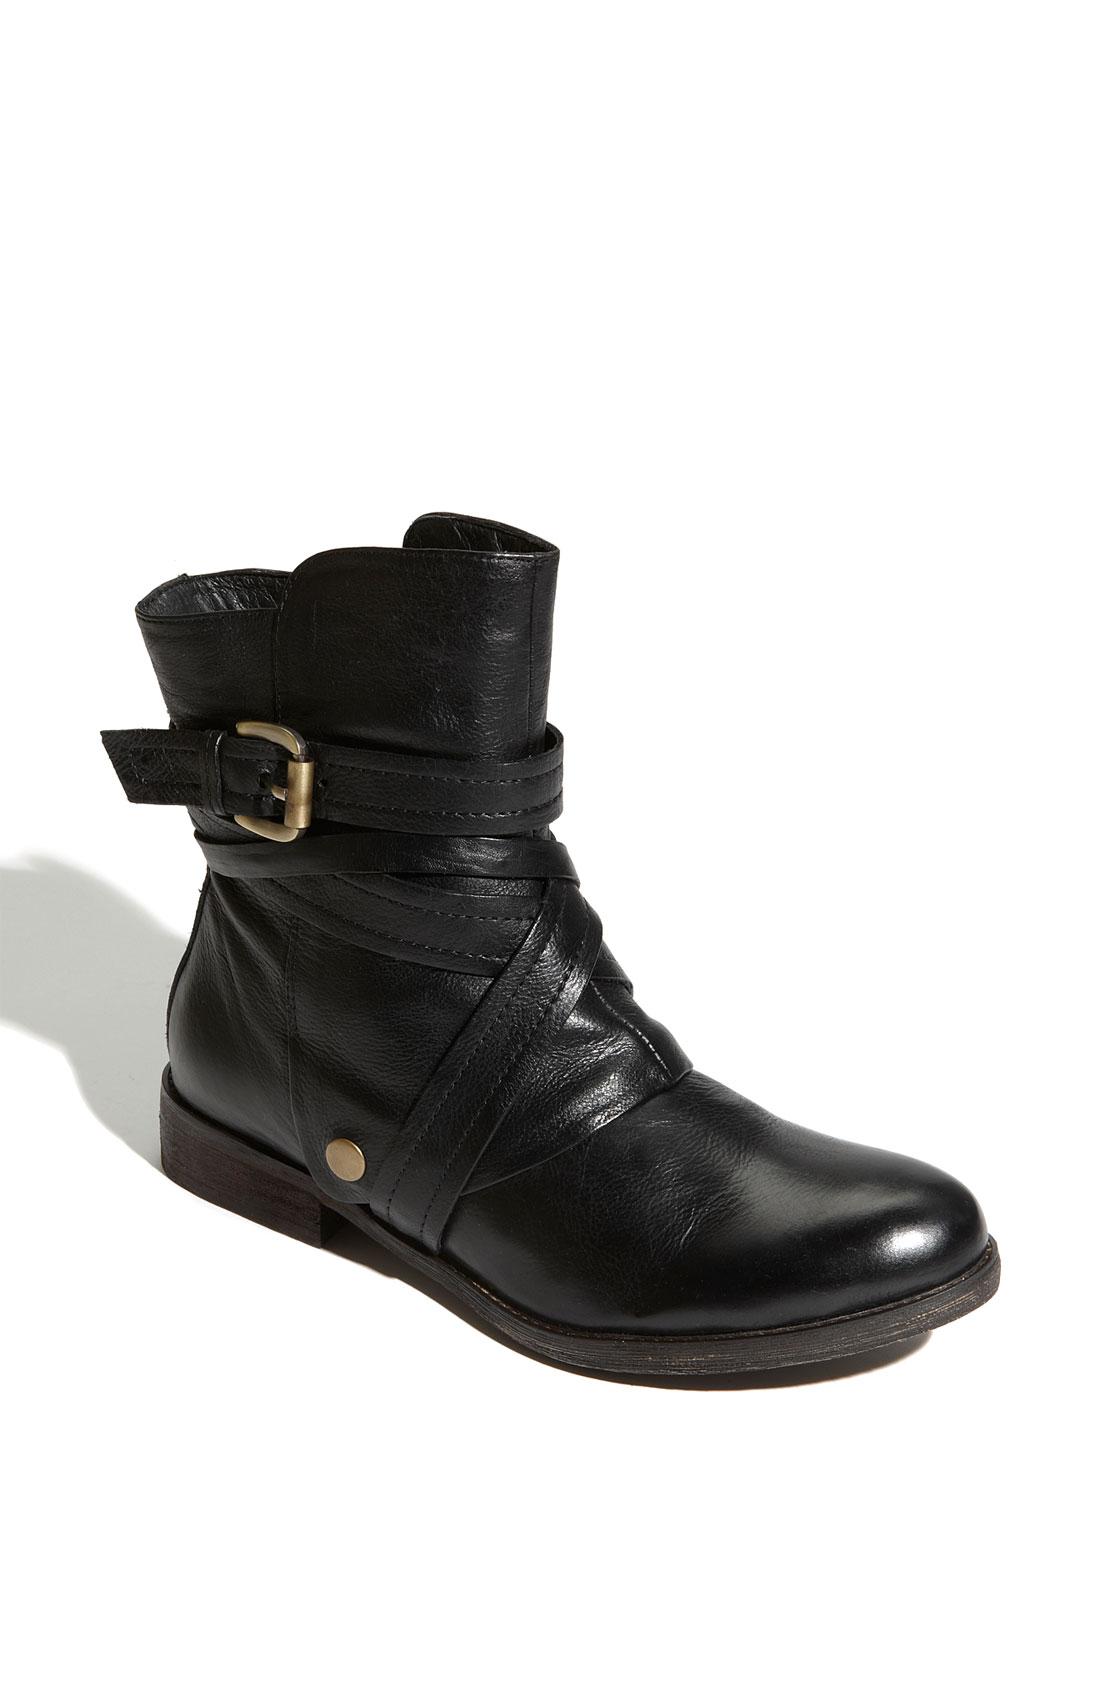 Miz Mooz Bailey Boot In Black